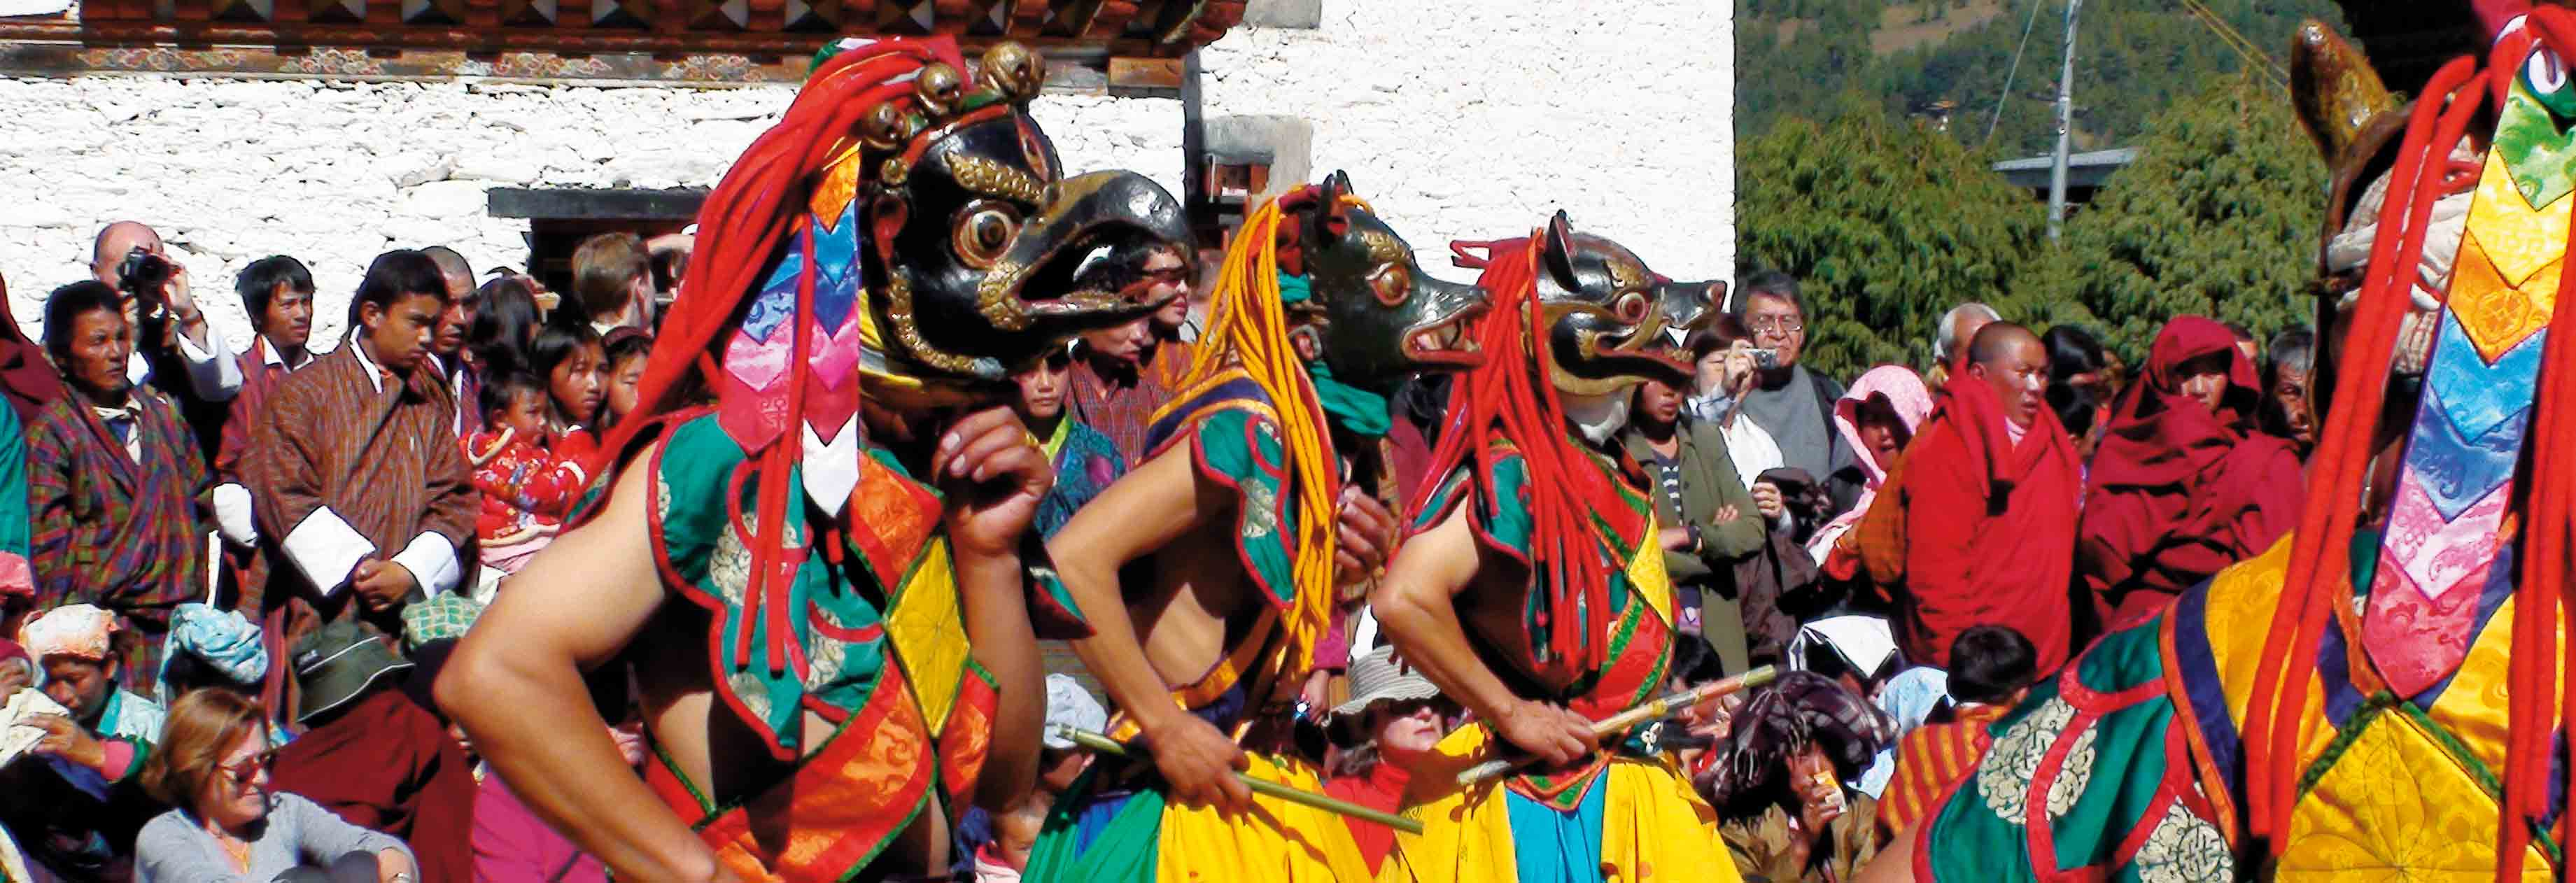 Farbenfrohe Feste in Bhutan